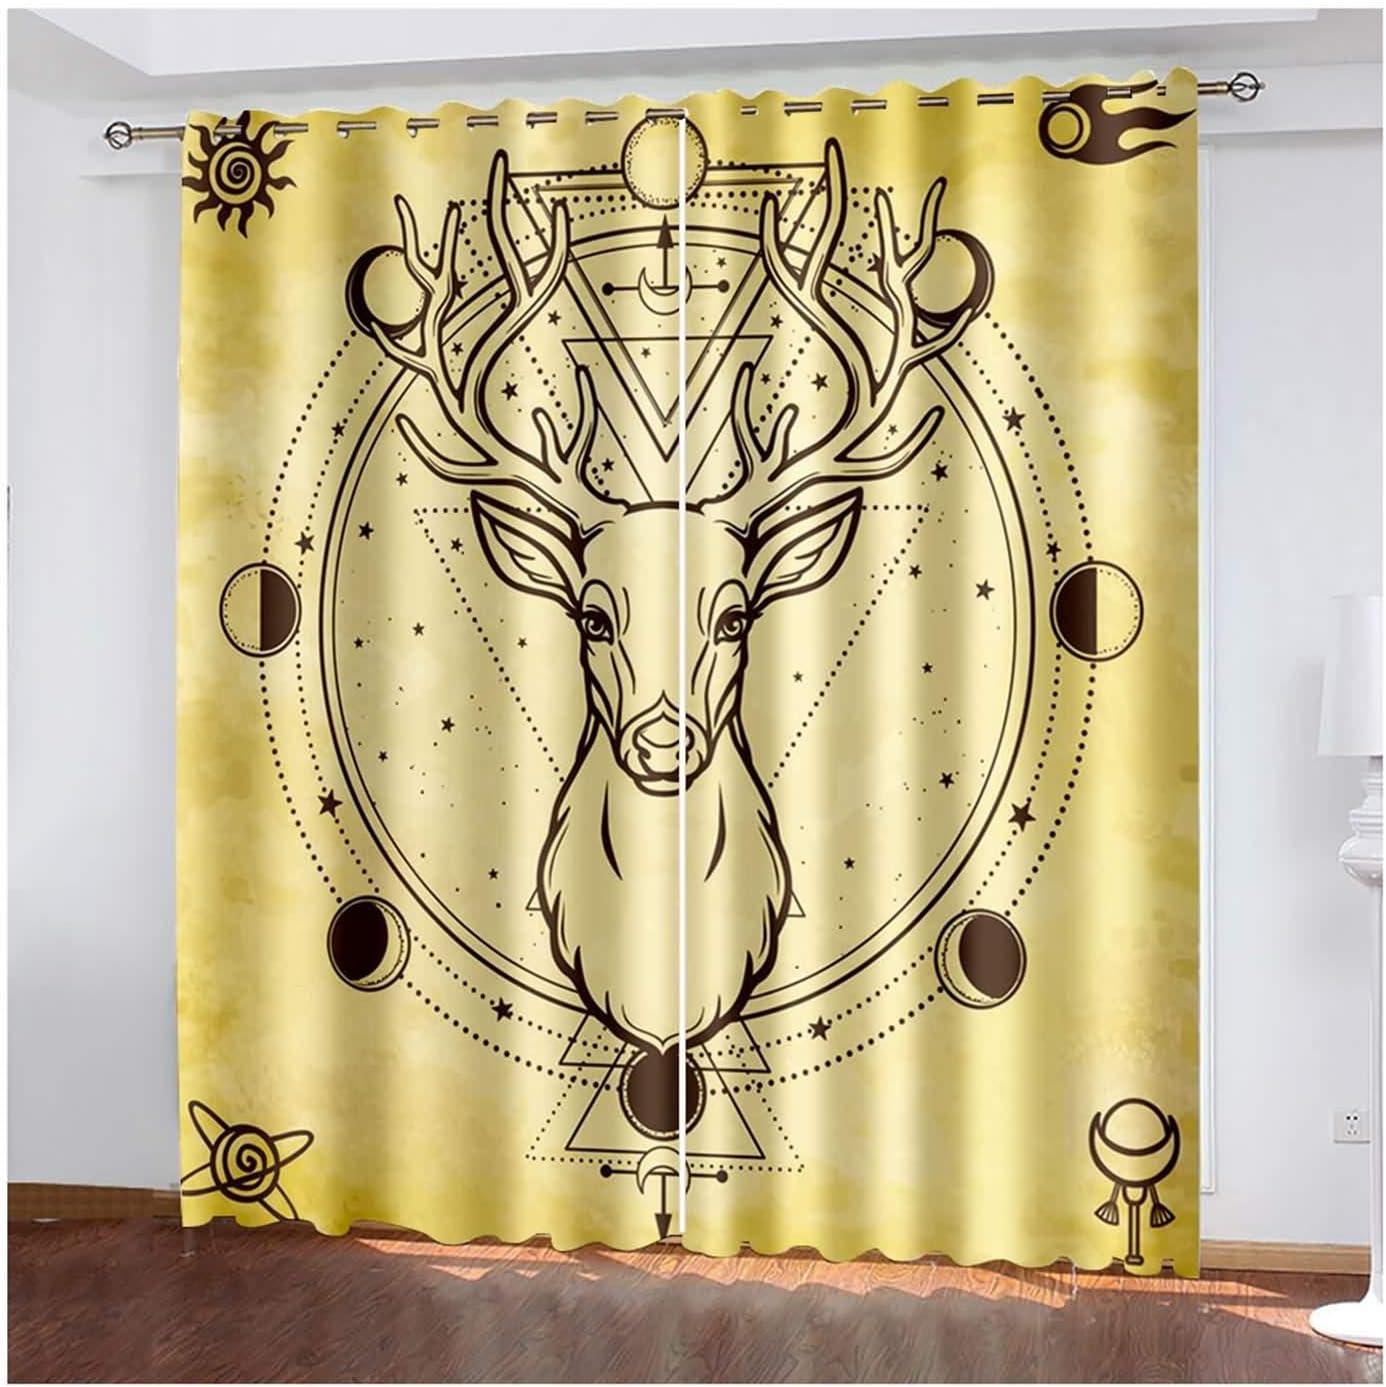 Daesar Blackout Popular popular Drapes 2 Panel Bedroom Kids Ge All items free shipping Curtain